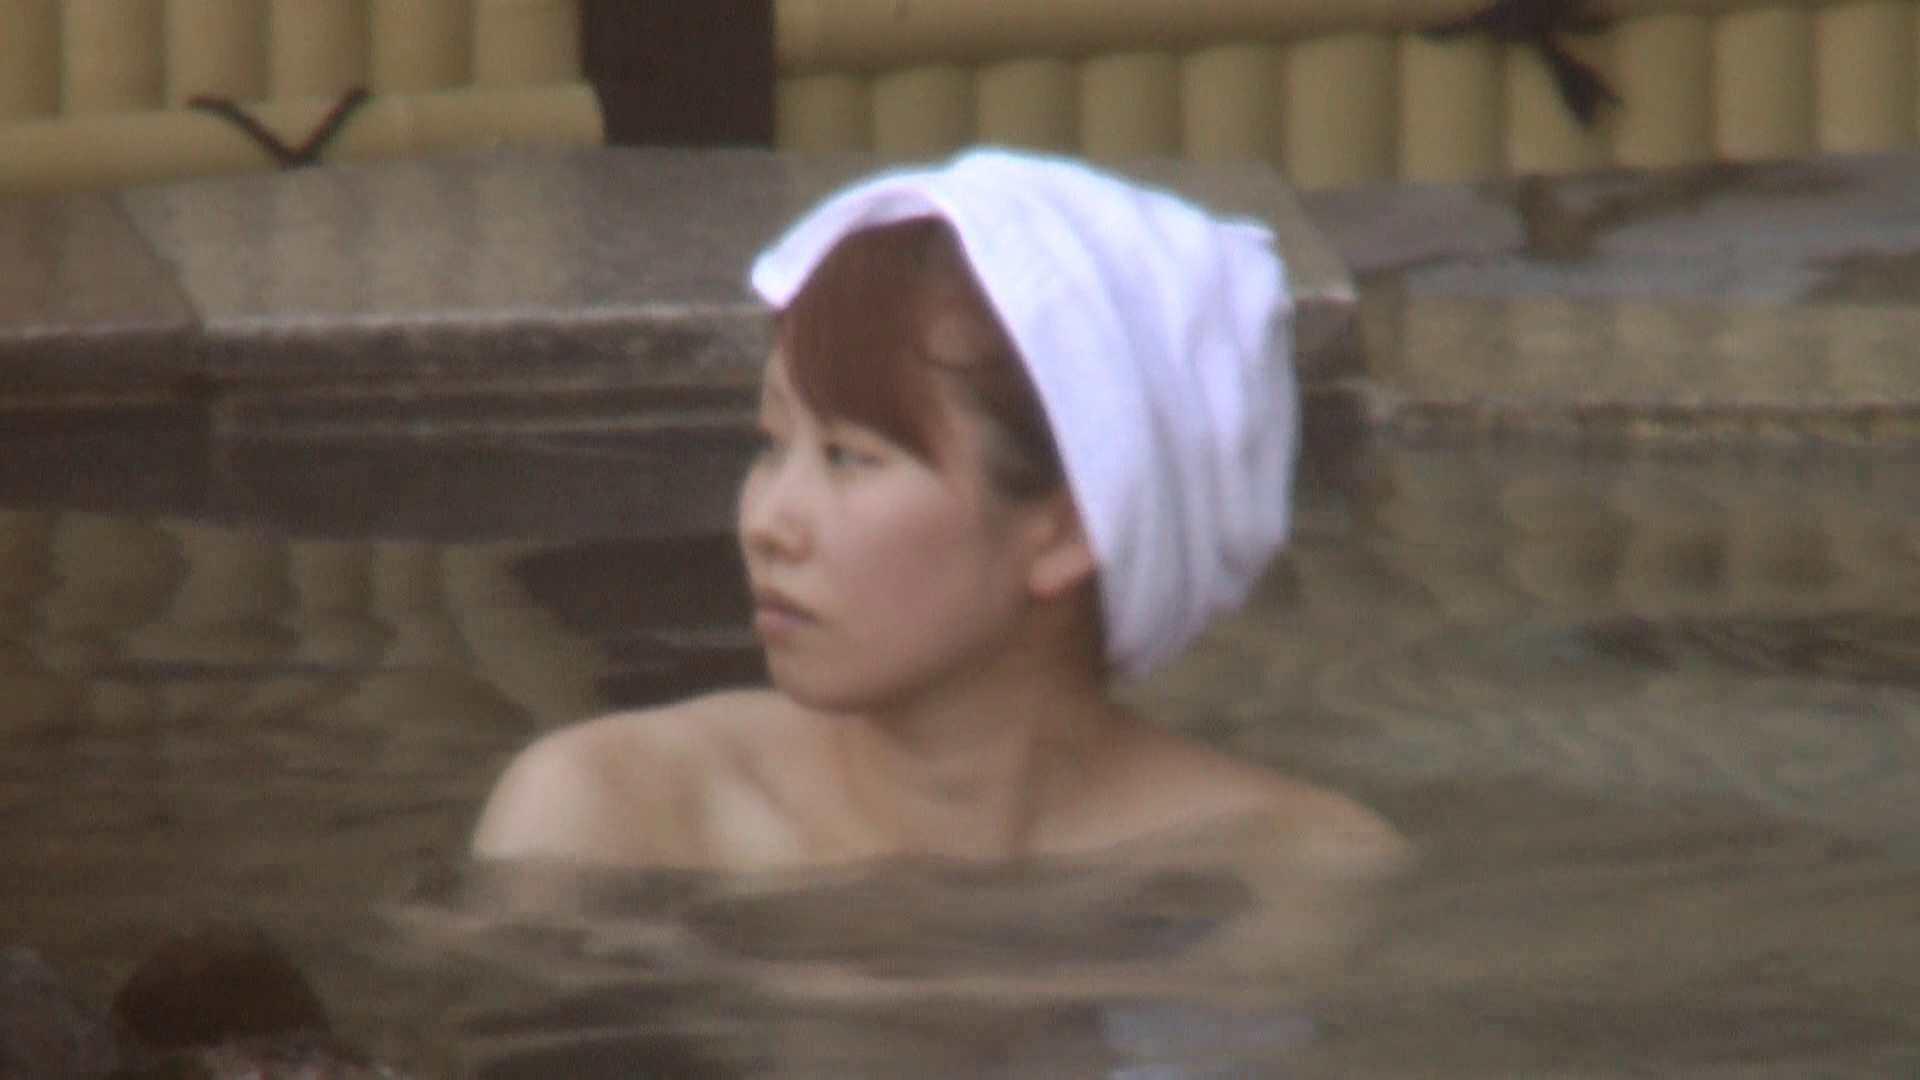 Aquaな露天風呂Vol.210 OL女体   露天  49連発 28